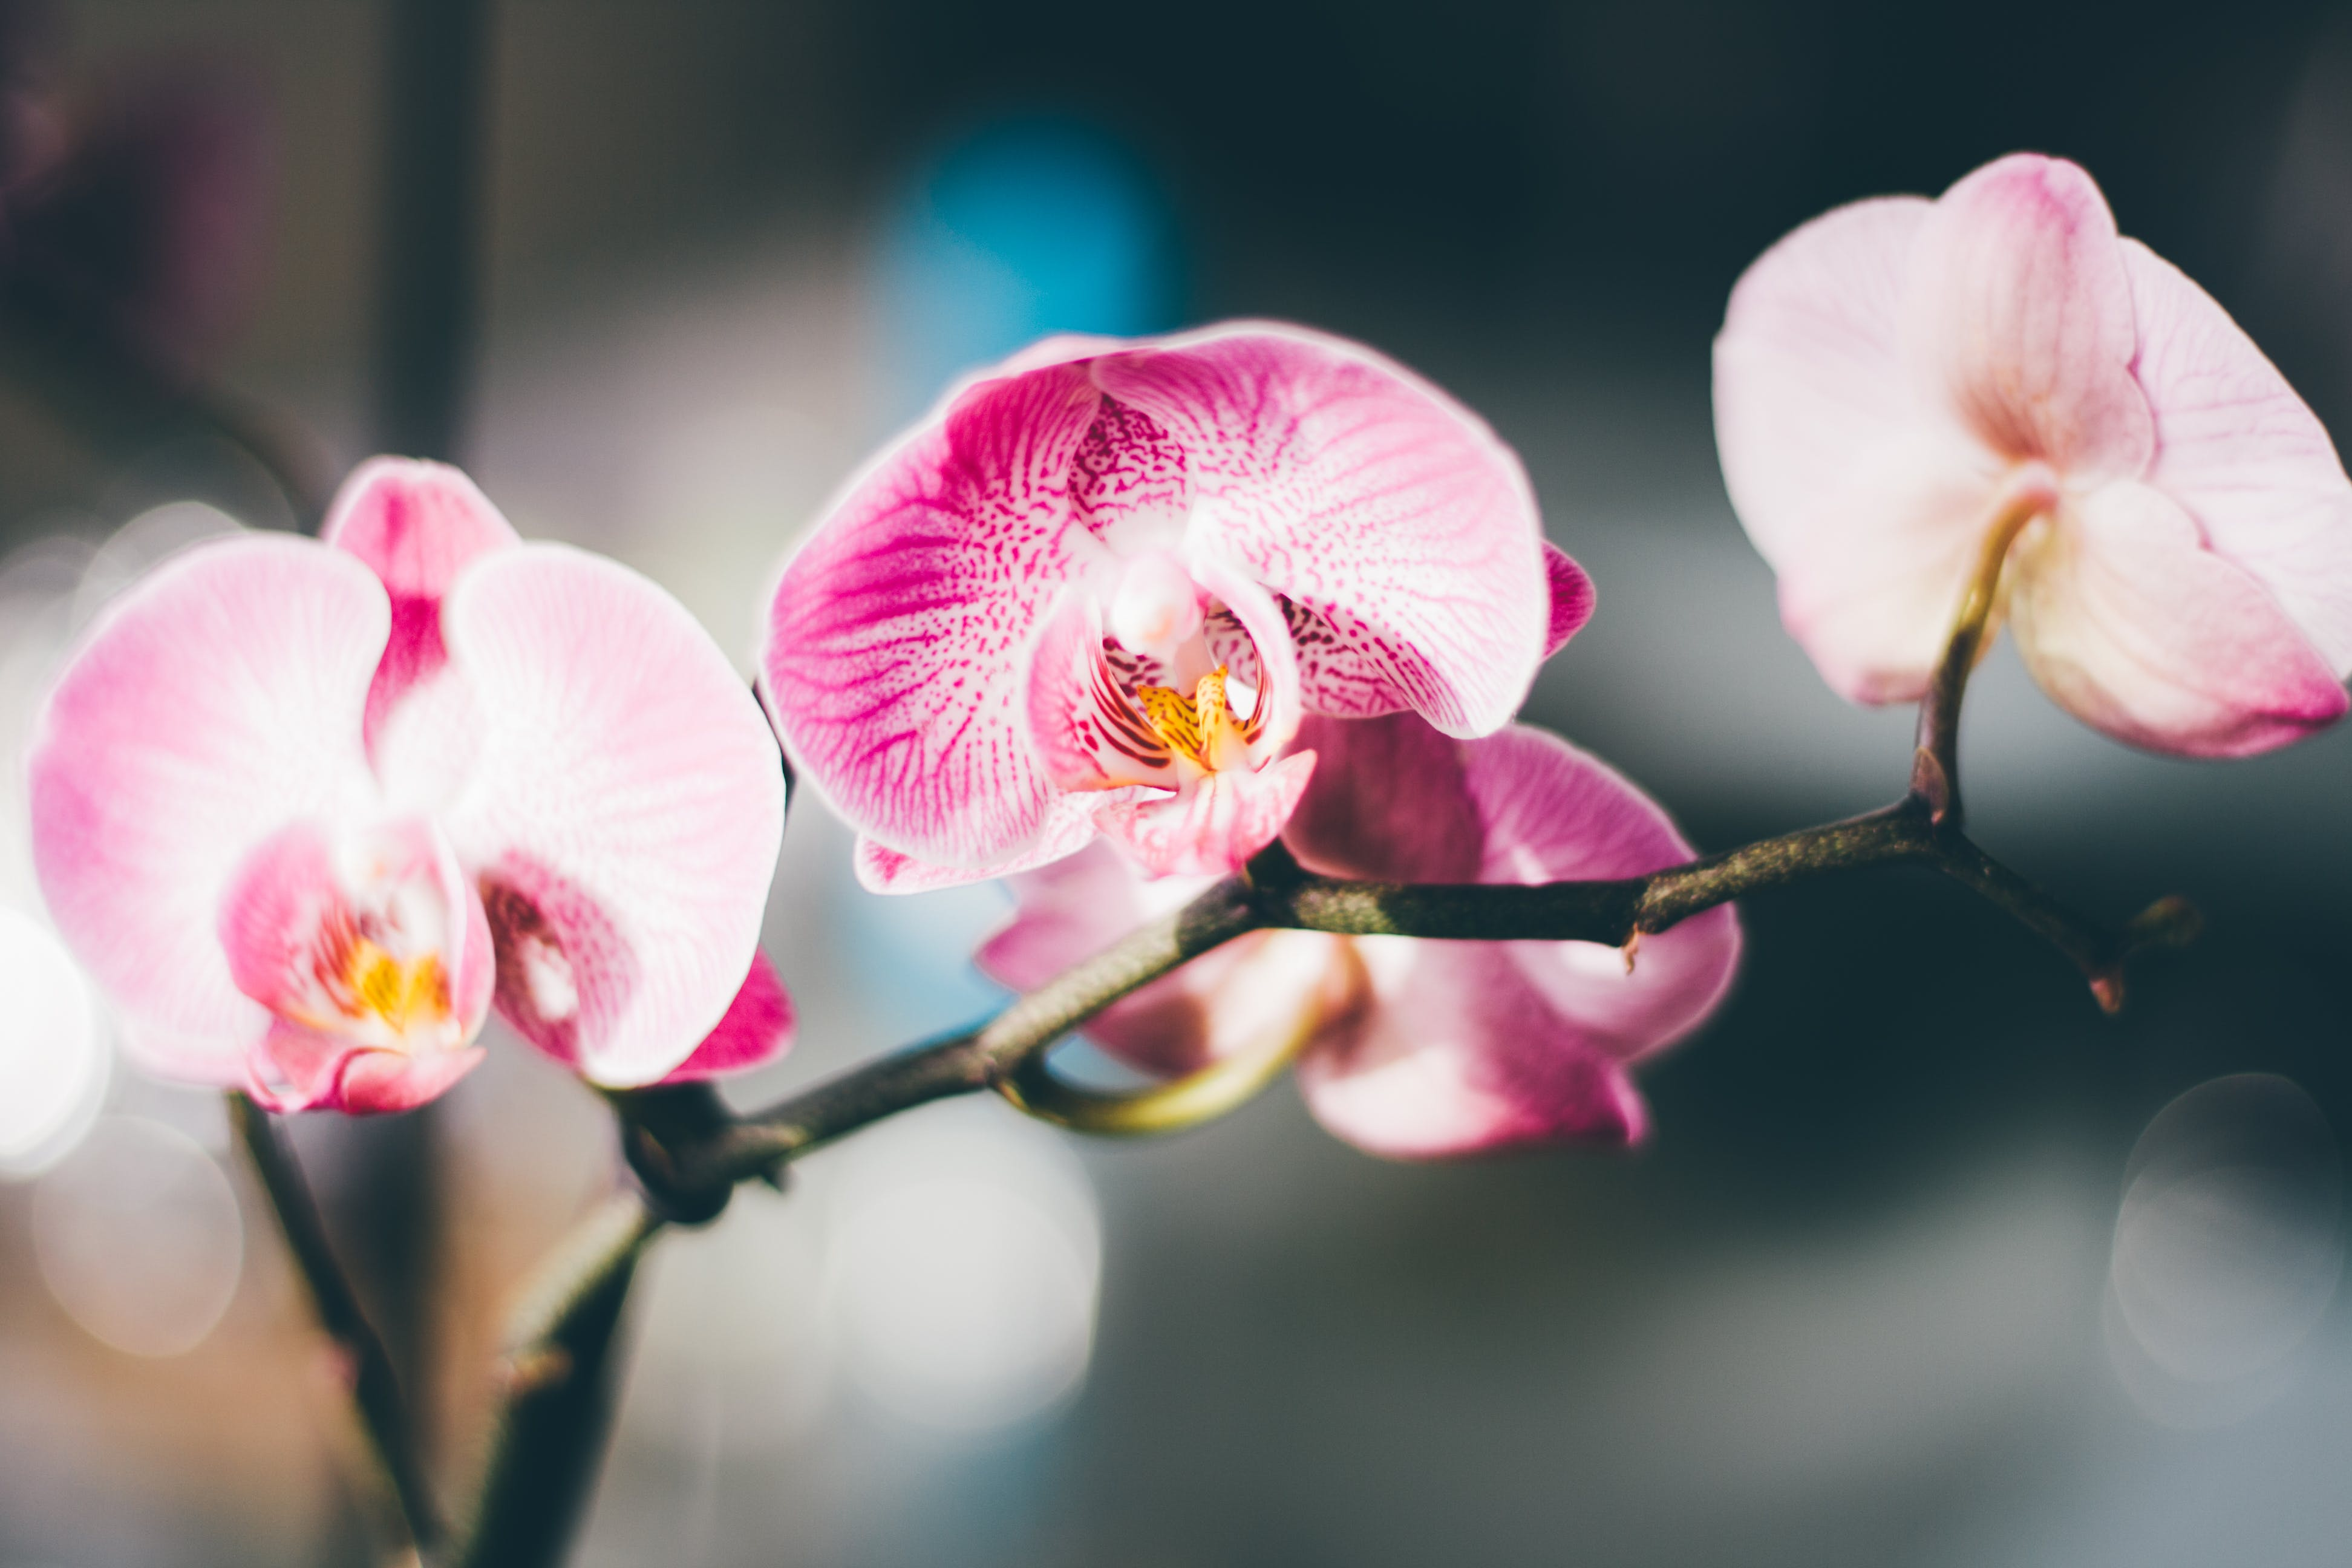 Fotos de stock gratuitas de flora, floración, flores, macro